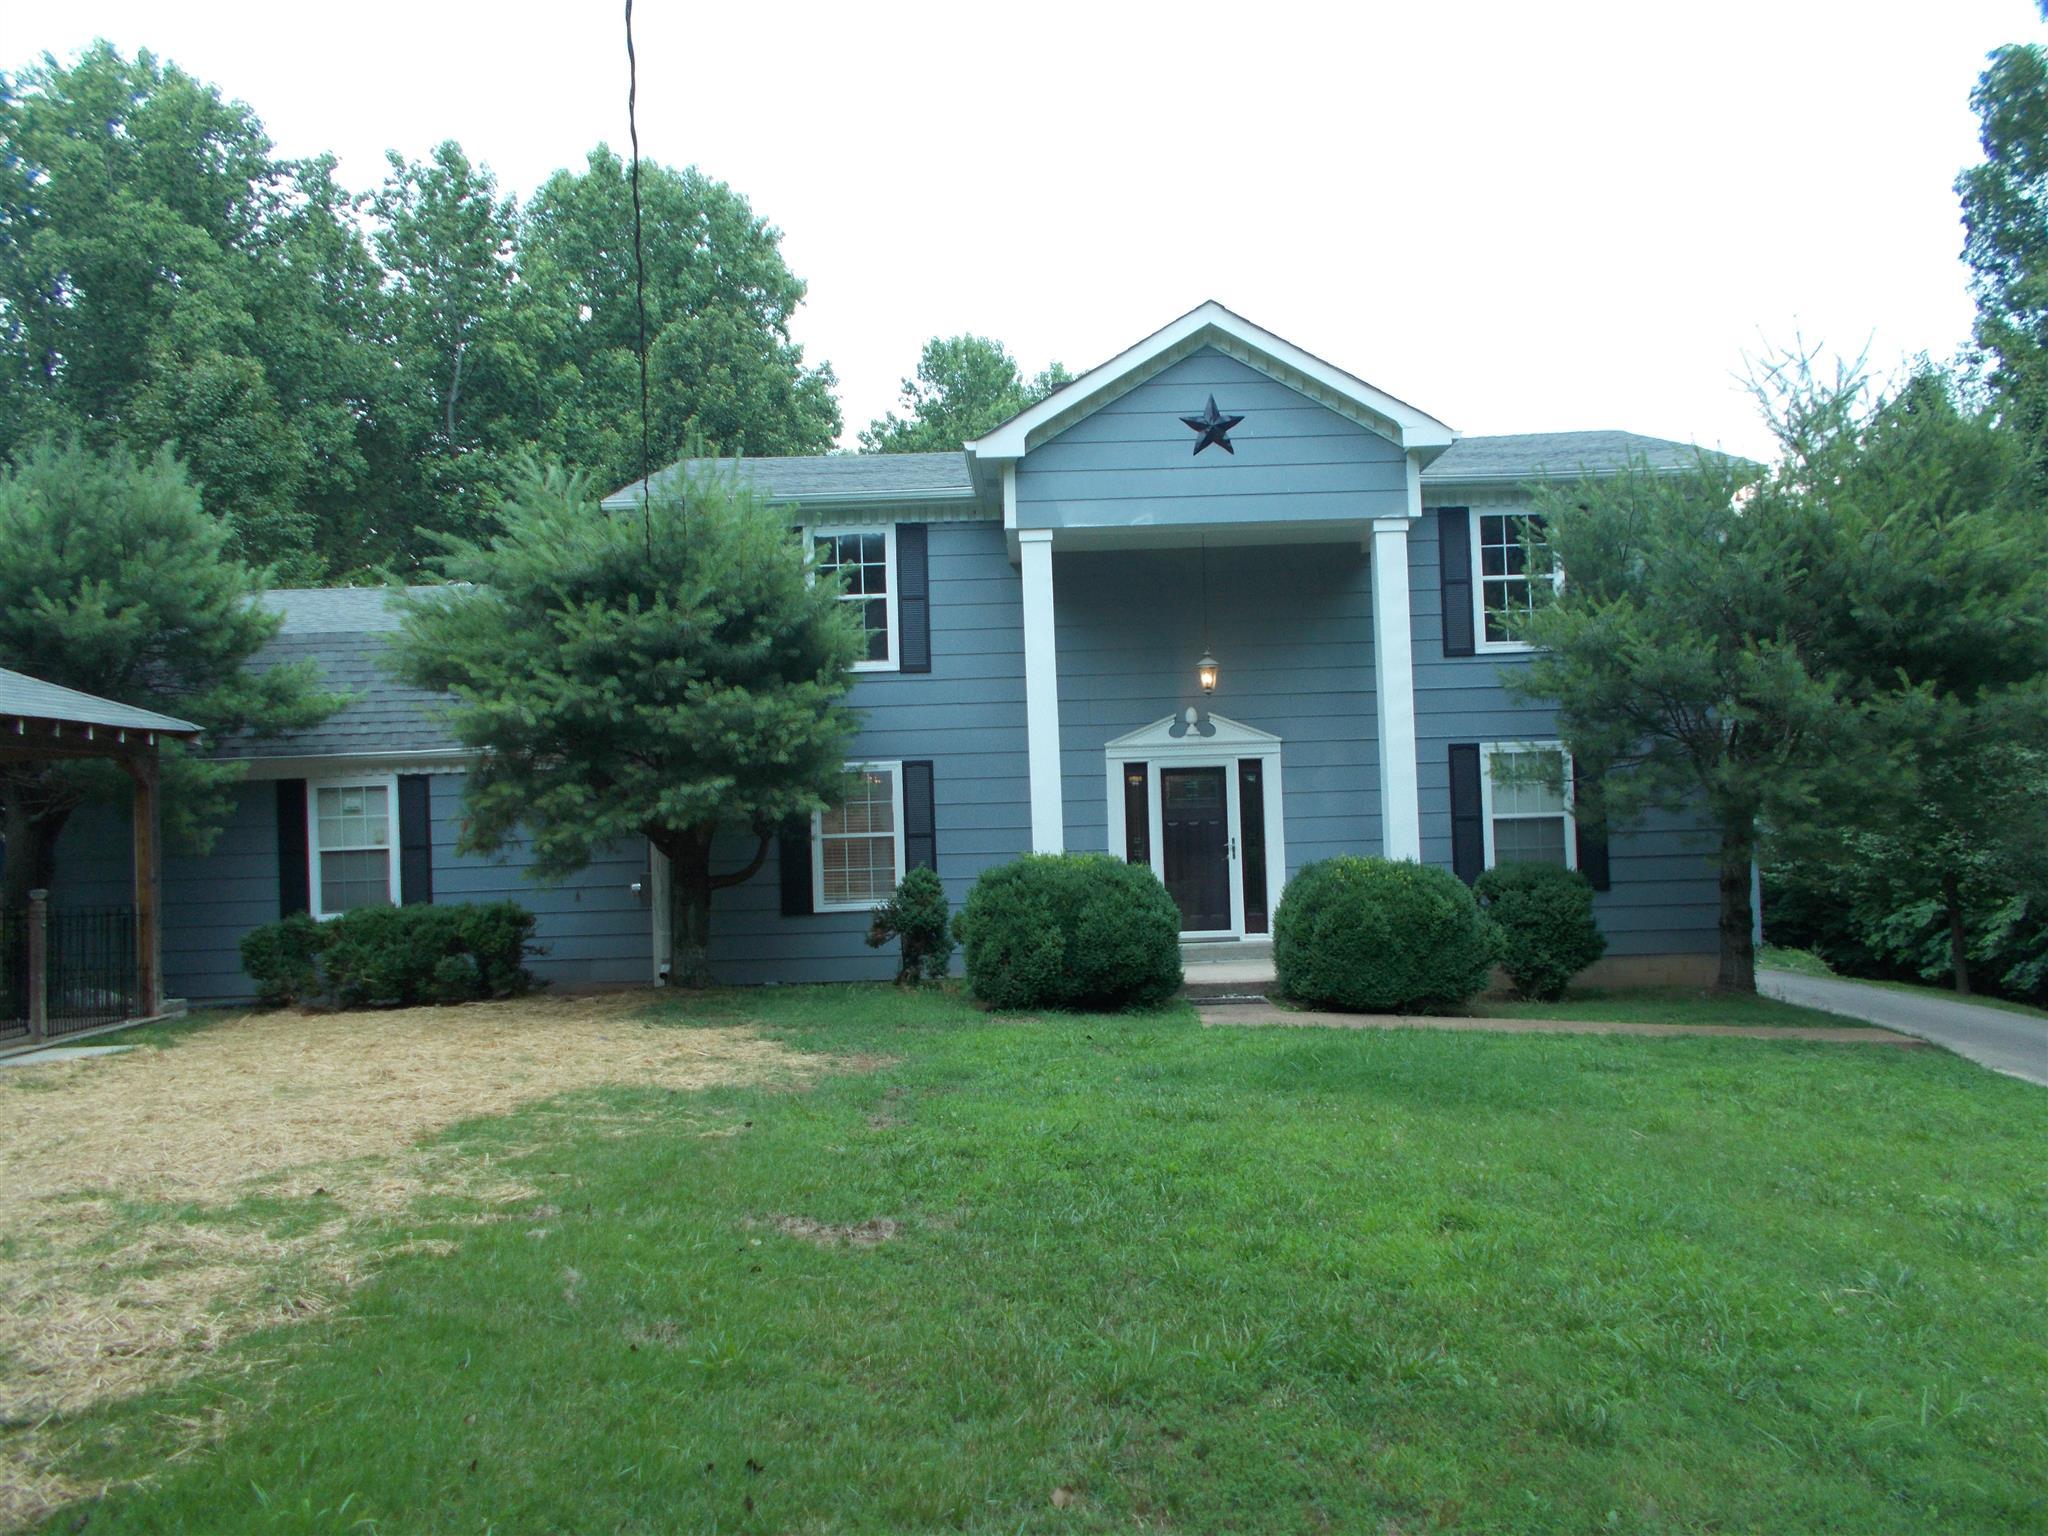 2948 Claylick Rd, Whites Creek, TN 37189 - Whites Creek, TN real estate listing